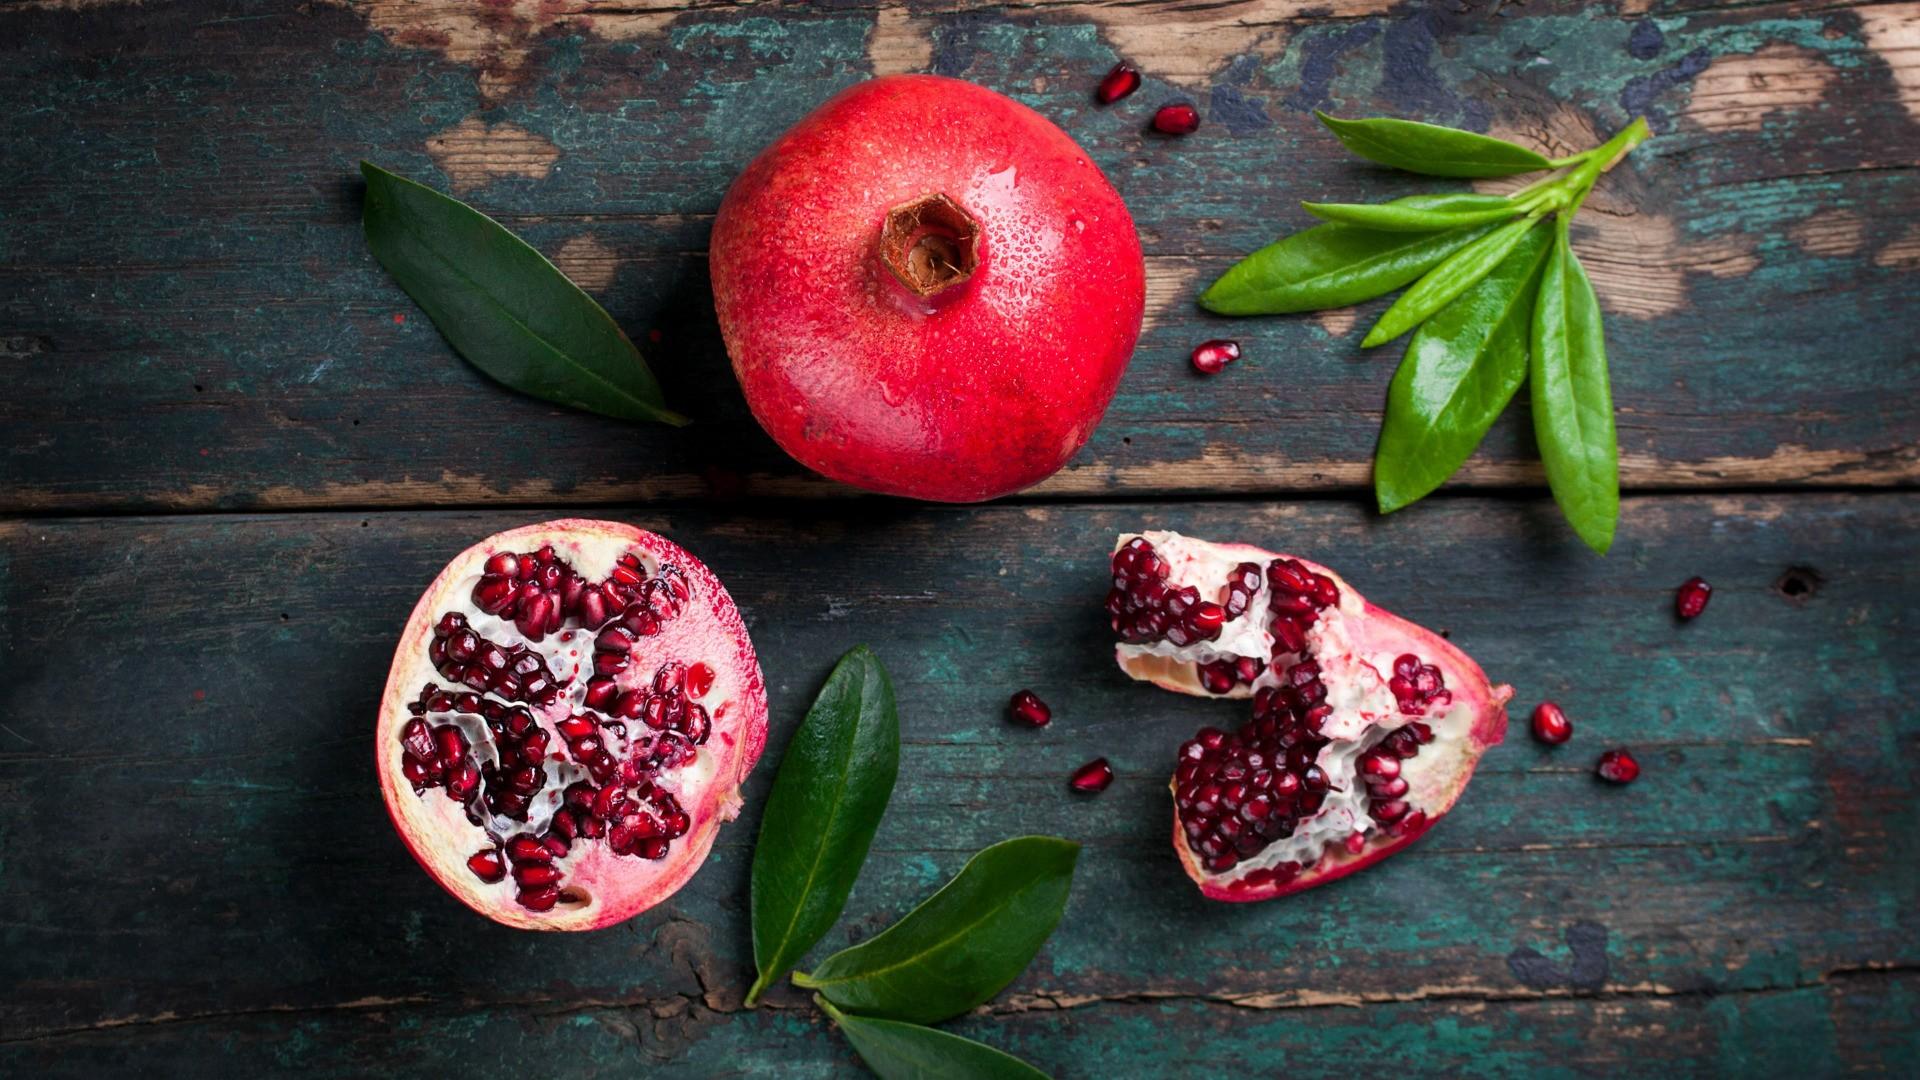 Pomegranate wallpaper photo full hd